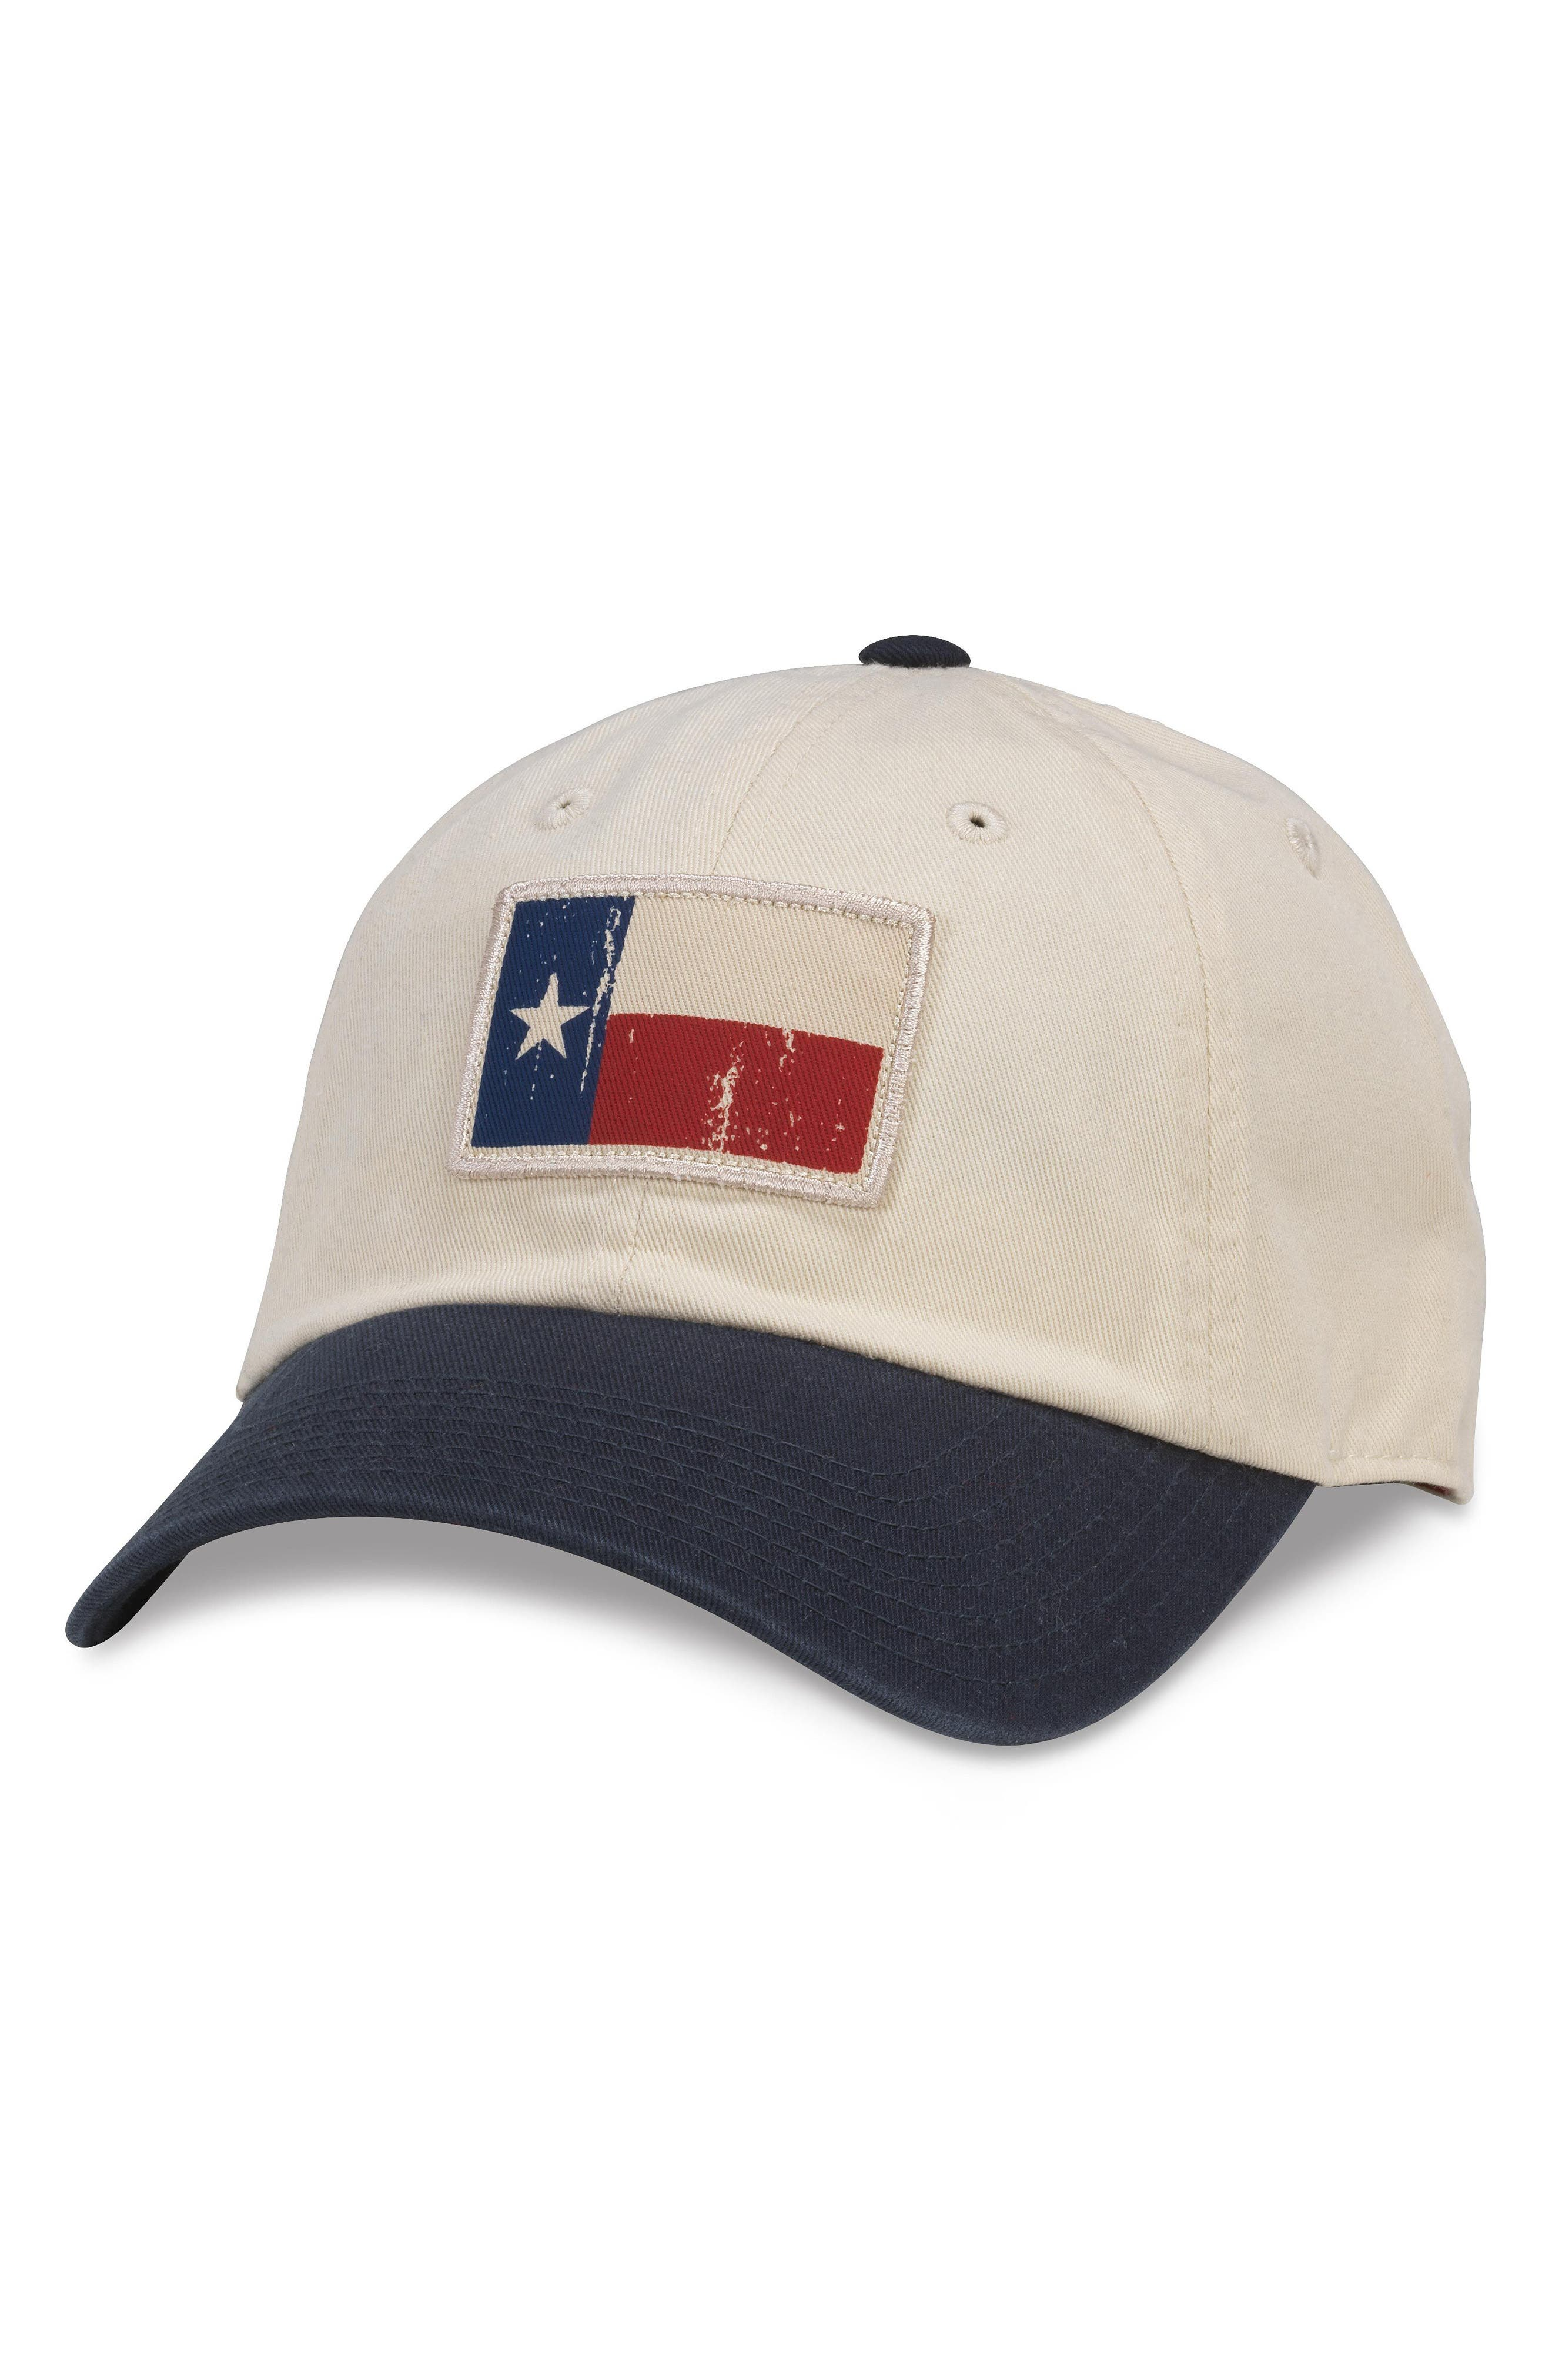 Badger Slouch - Texas Baseball Cap,                             Main thumbnail 1, color,                             Ivory/ Navy